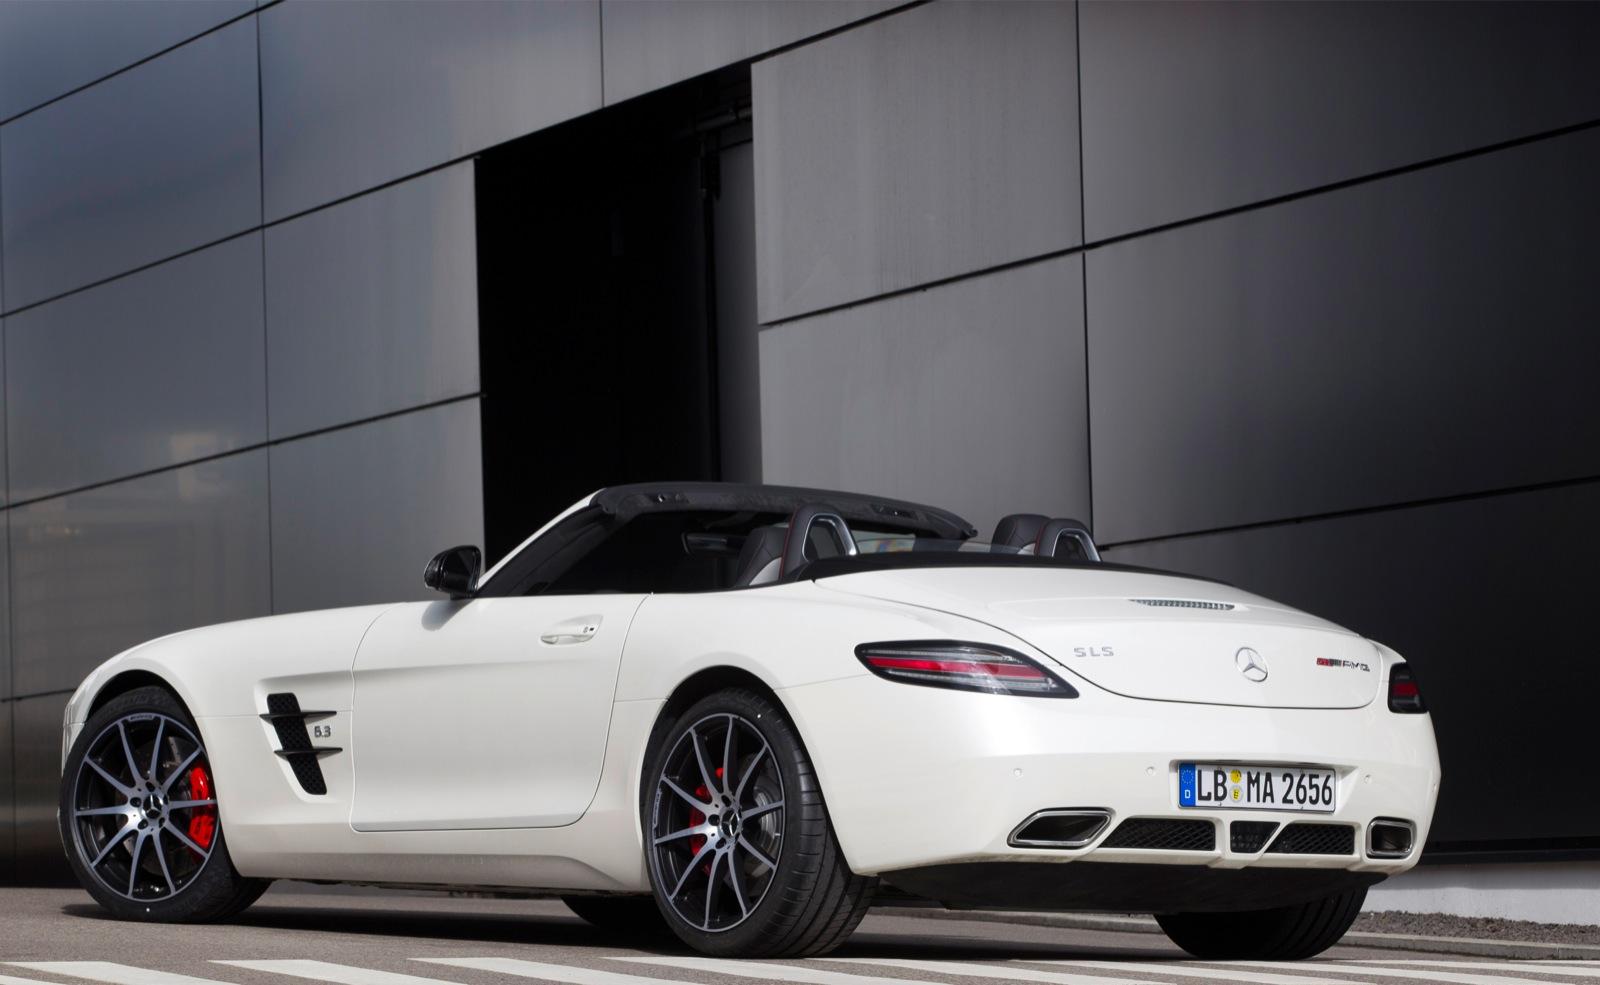 Alfa img showing gt sls amg gt roadster interior -  Mercedes Benz Sls Amg Roadster 2012 2014